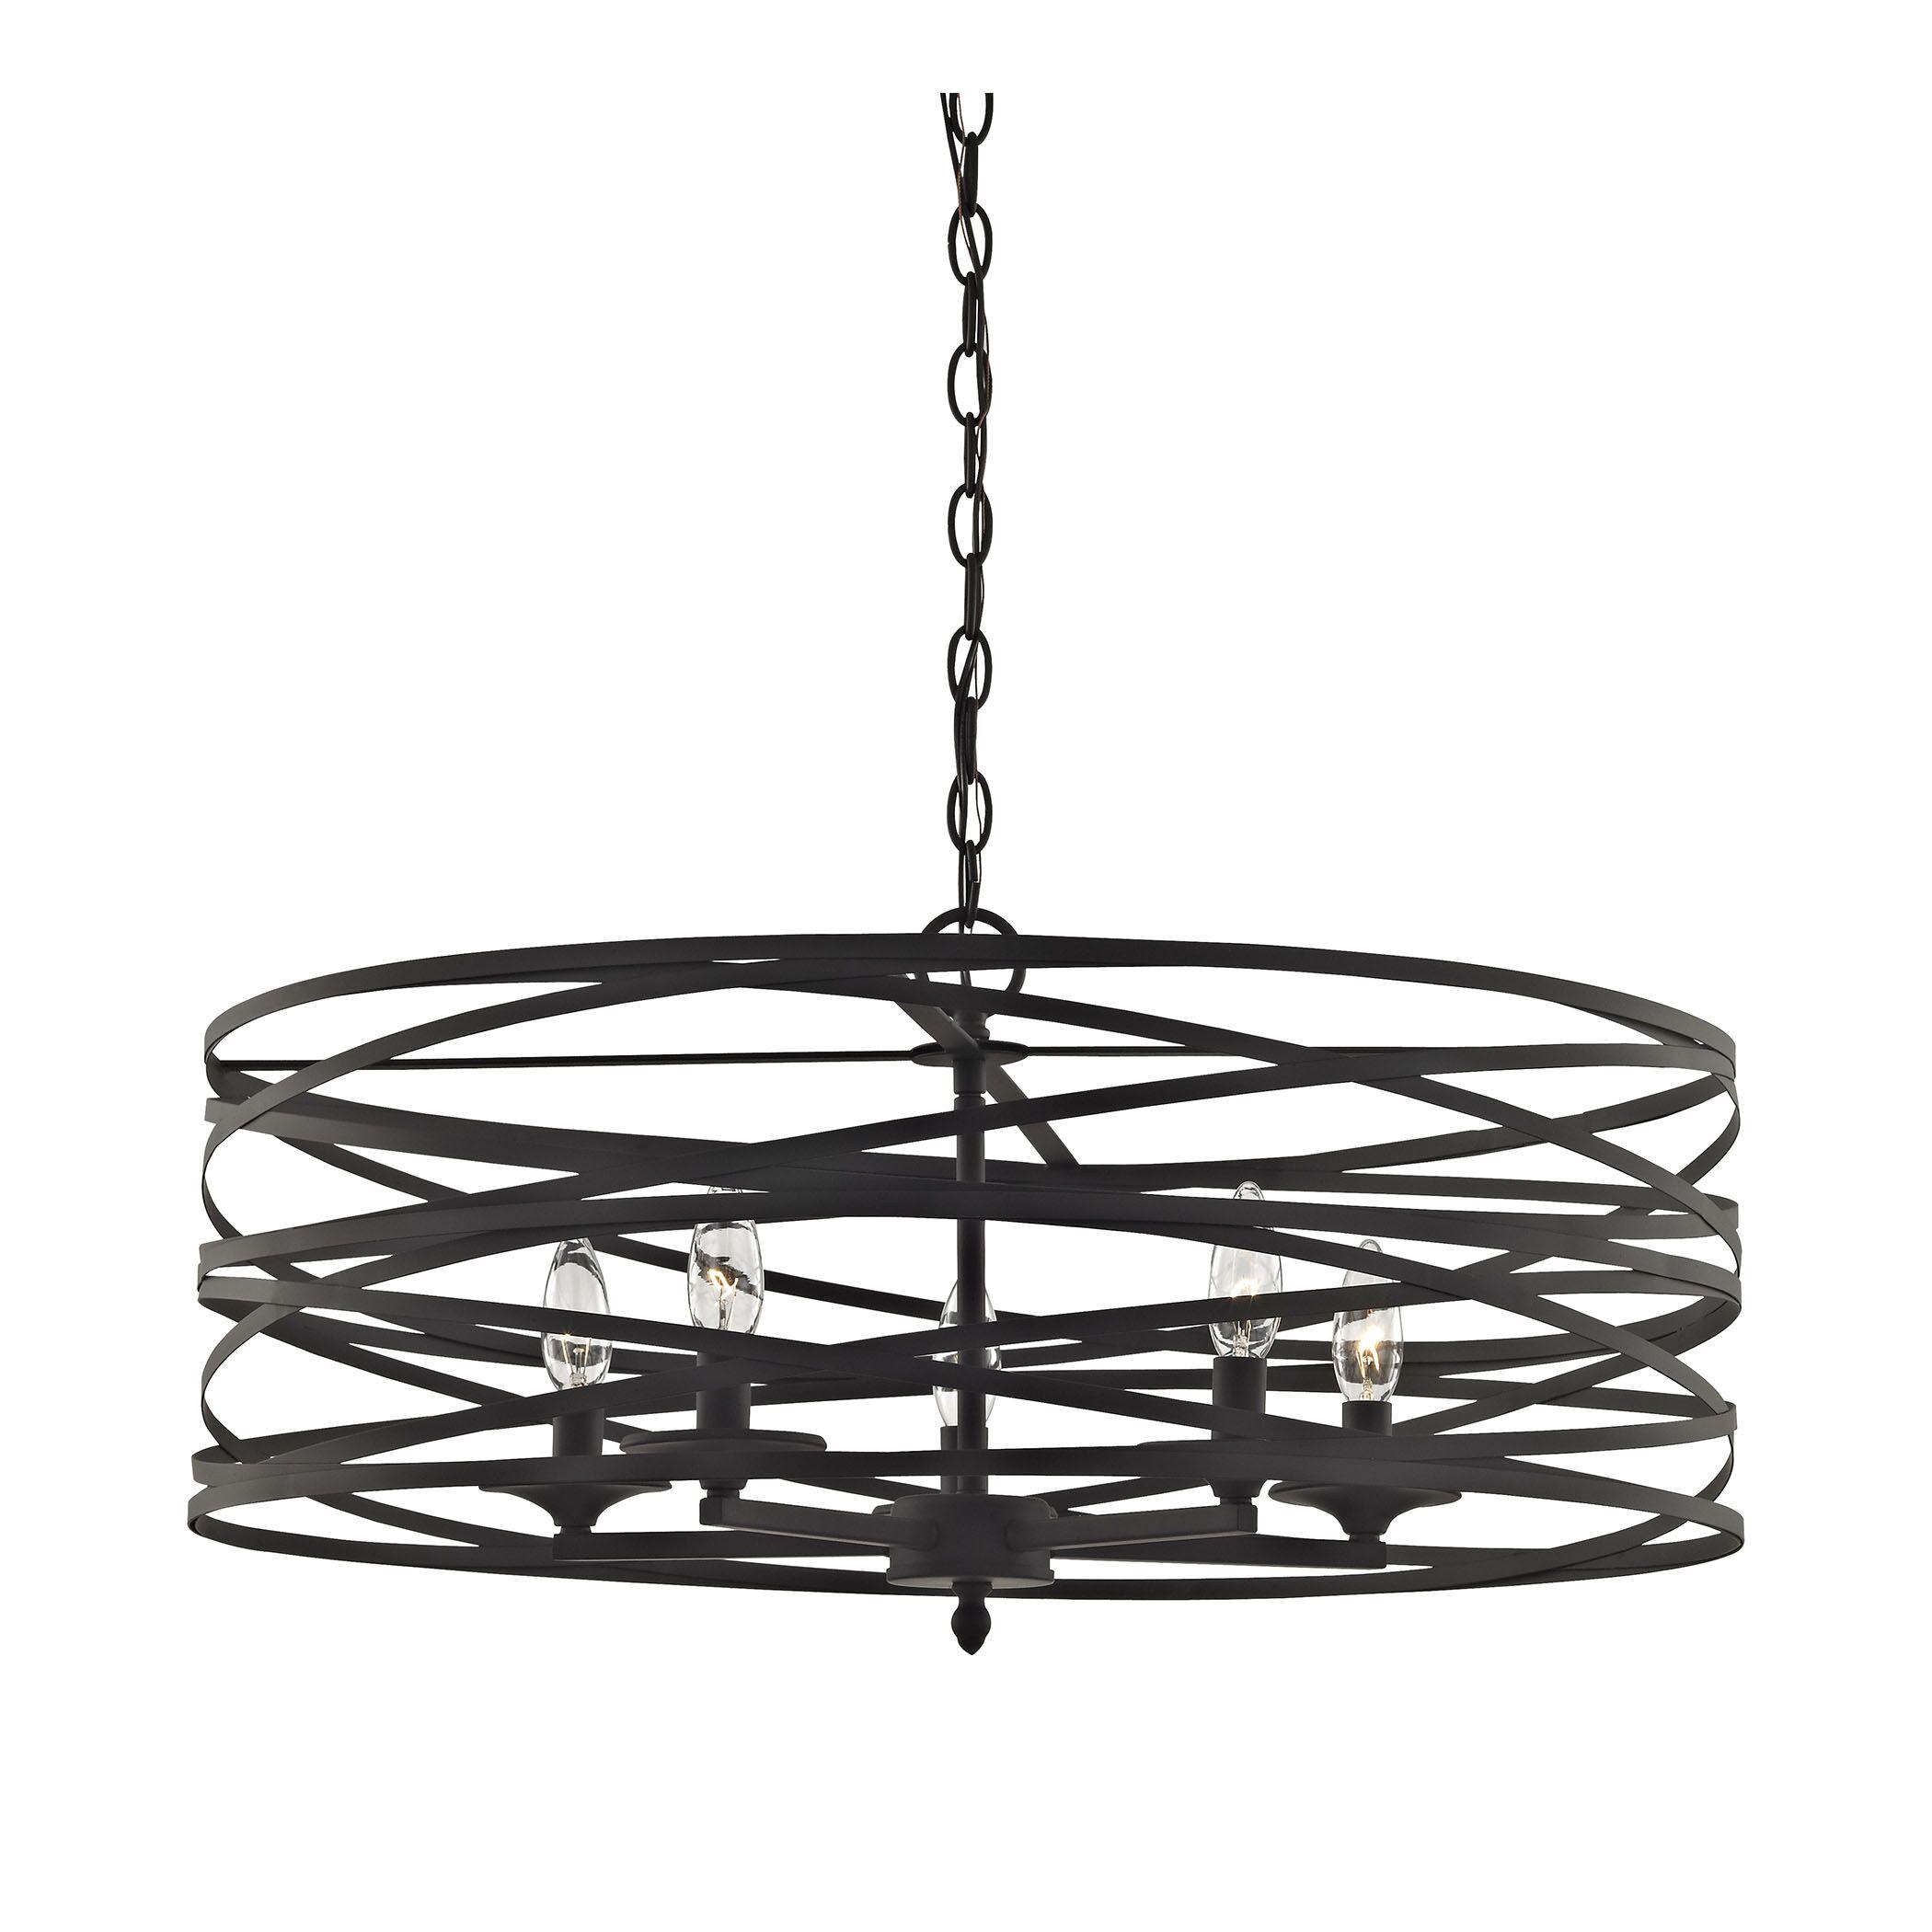 Bazemore 5-Light Drum Pendant